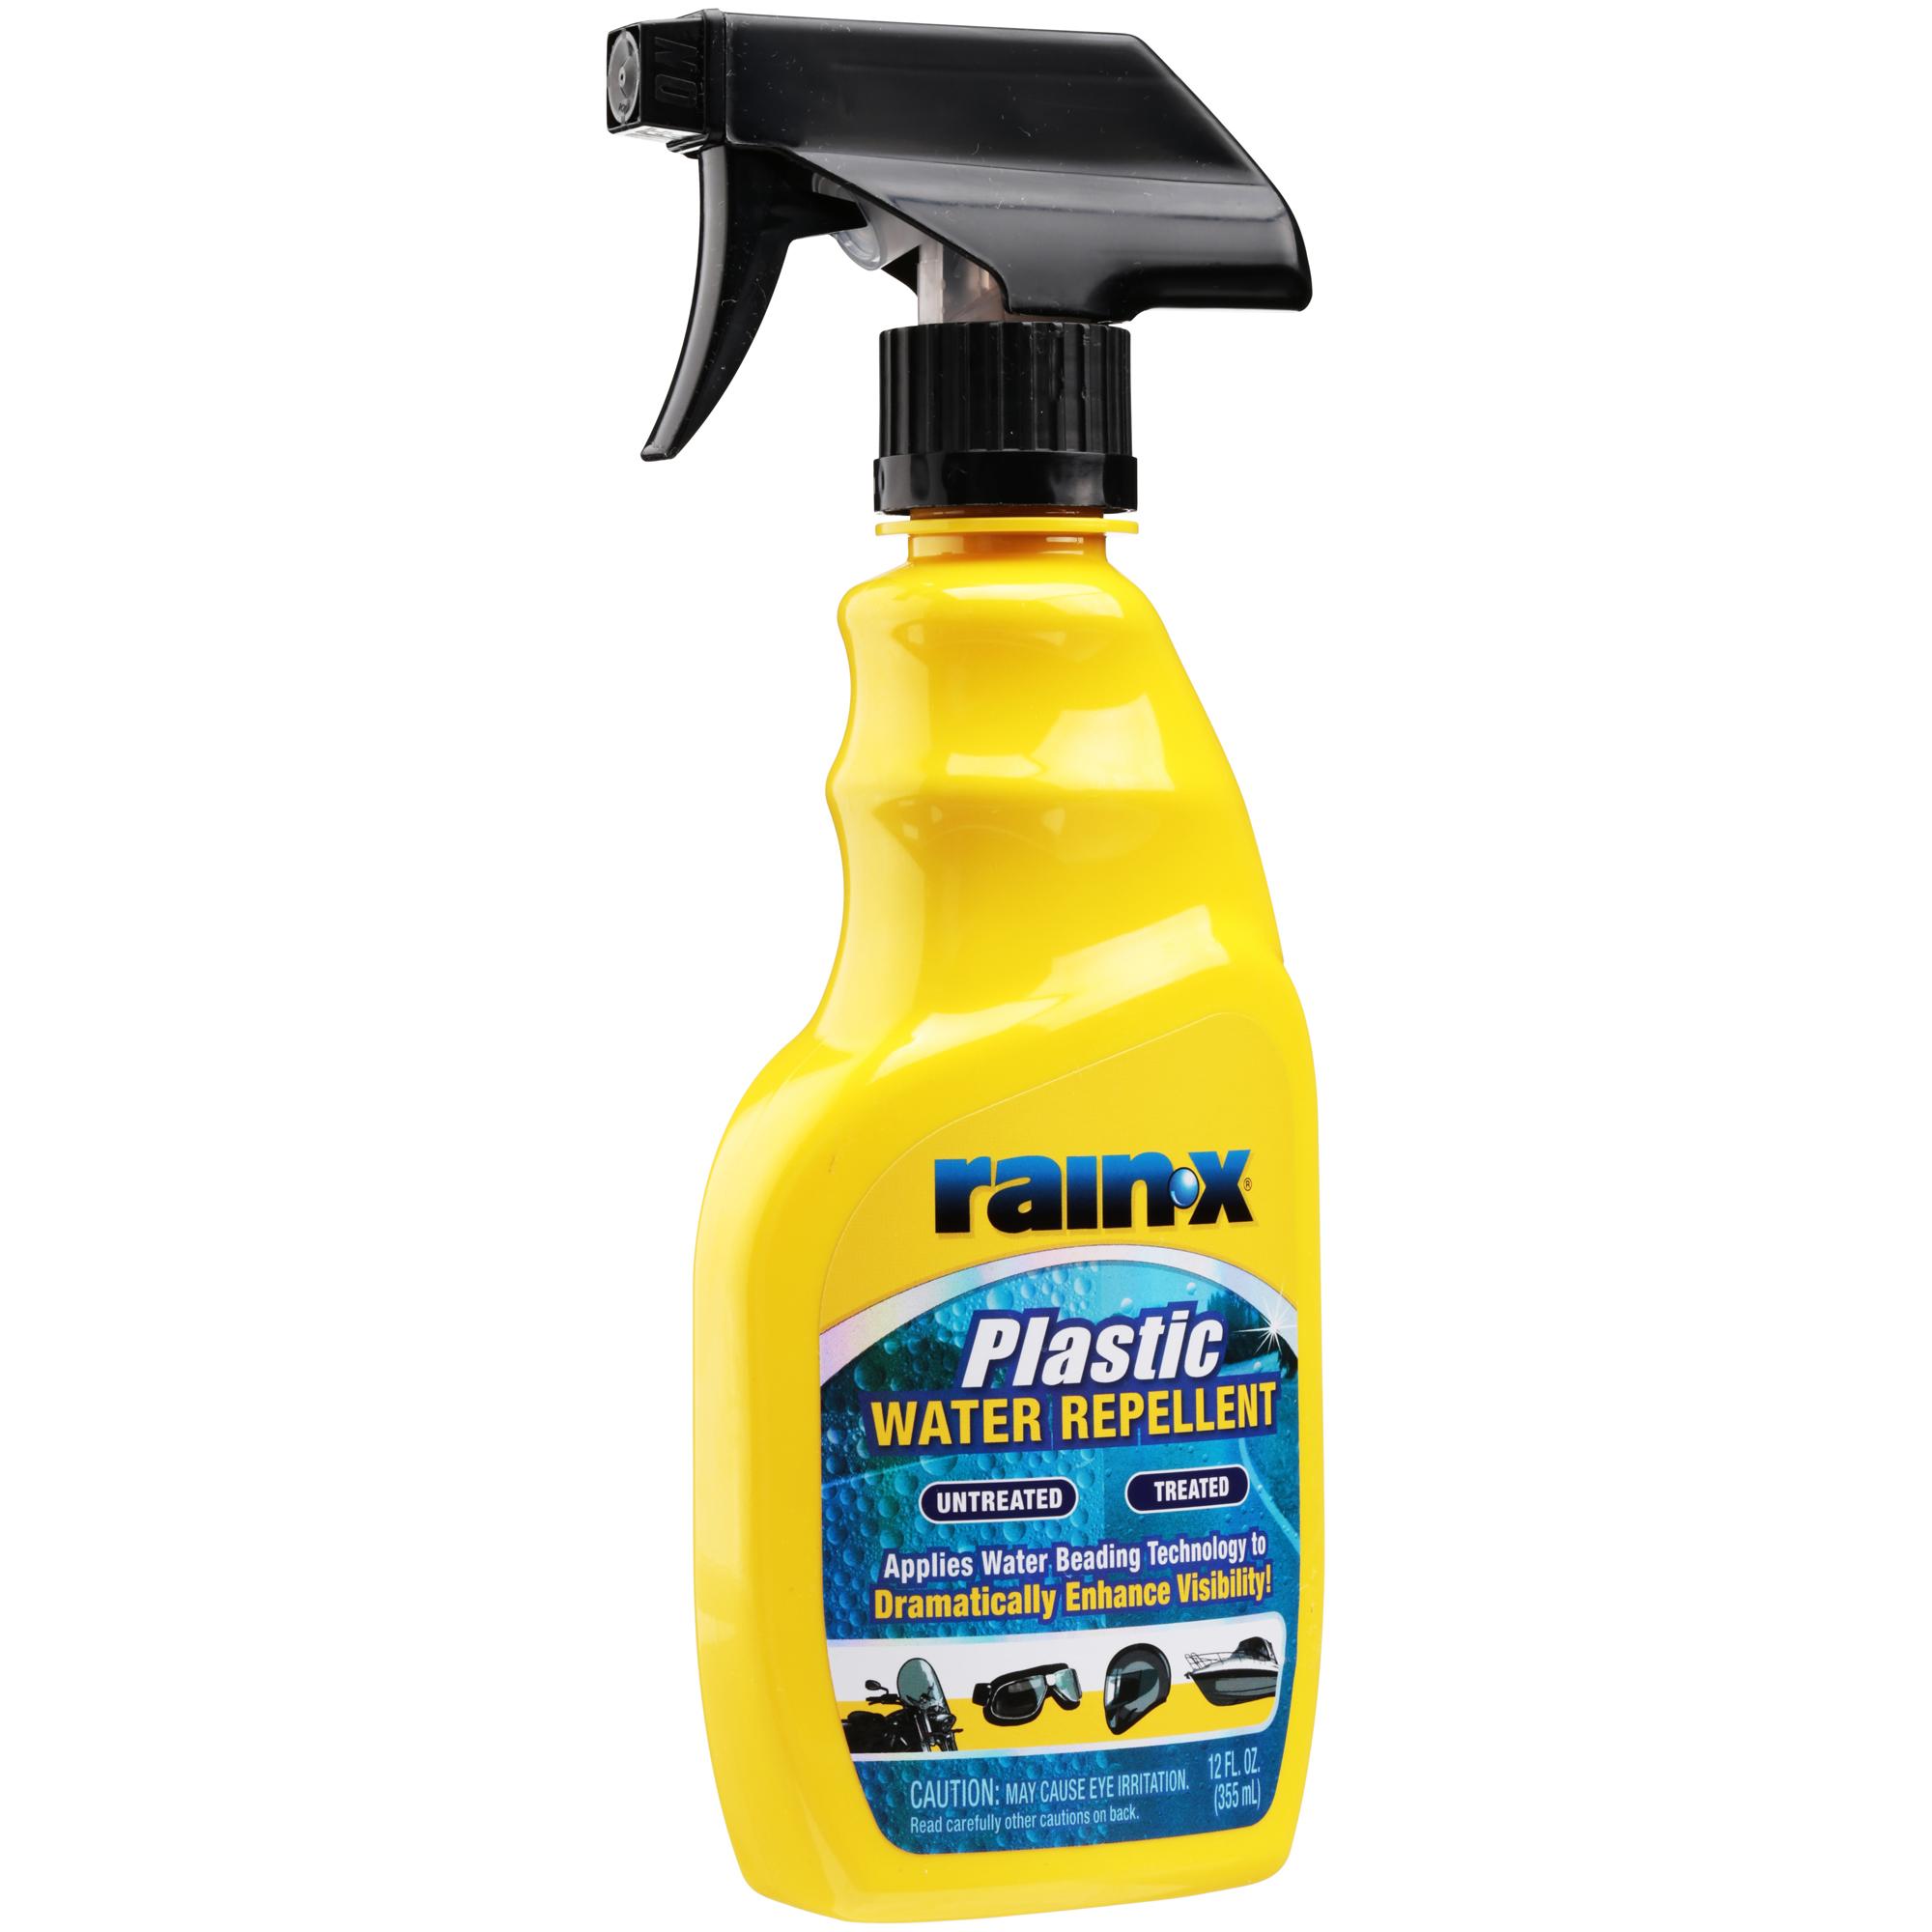 Rain-X® Plastic Water Repellent 12 fl. oz. Spray Bottle